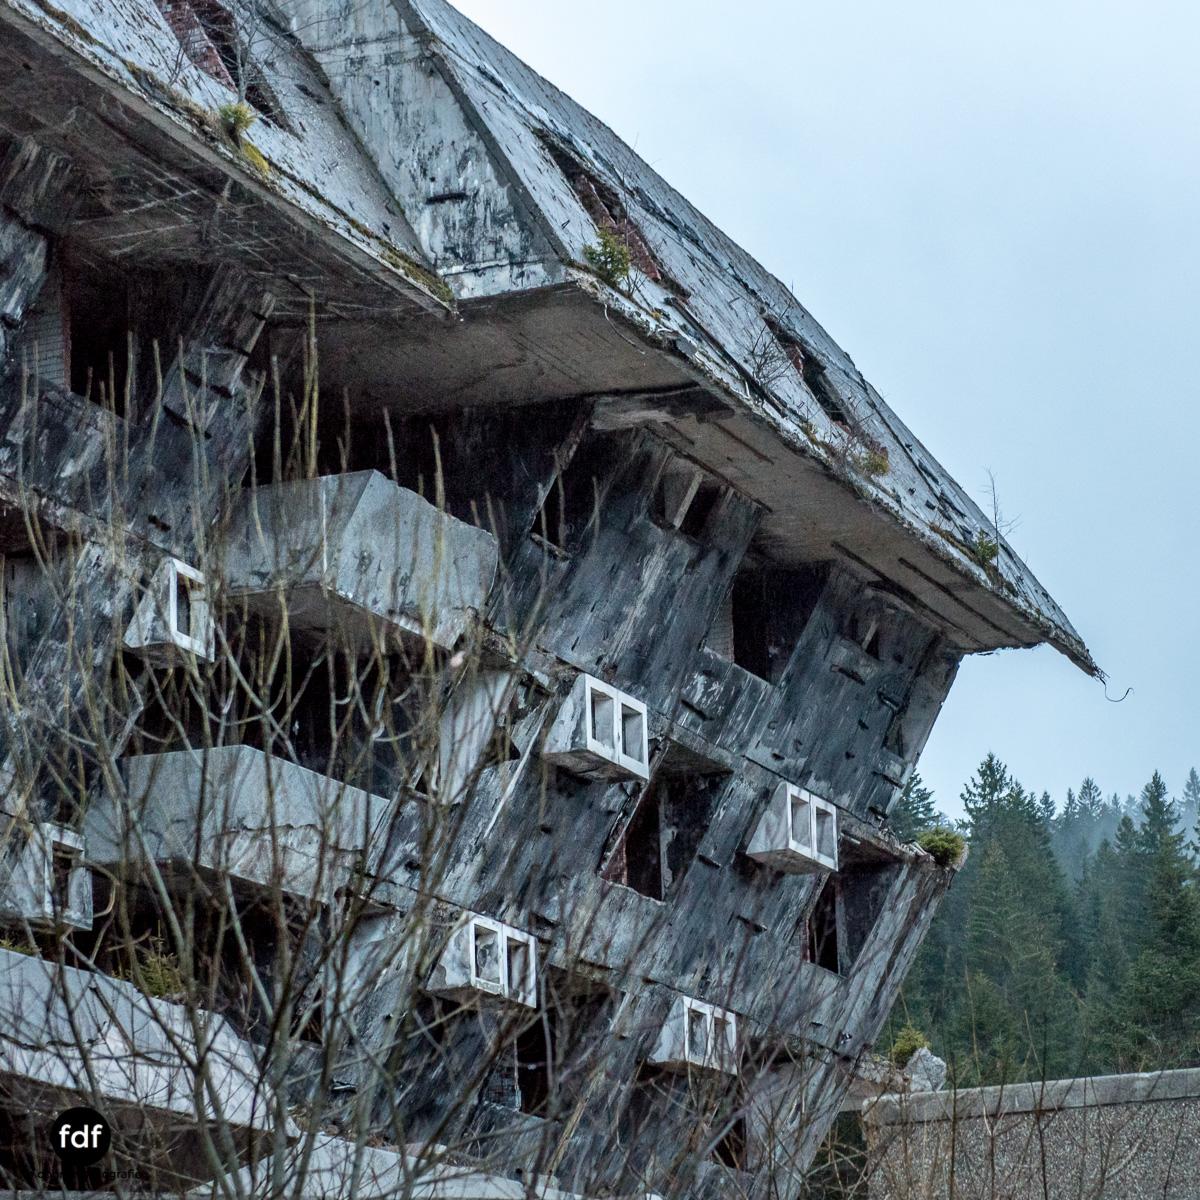 Hotel-Igman-Skijump-Skisprung-Sarajevo-Olympia84-Bosnien-Herzigowina-Lost-Place-20.JPG